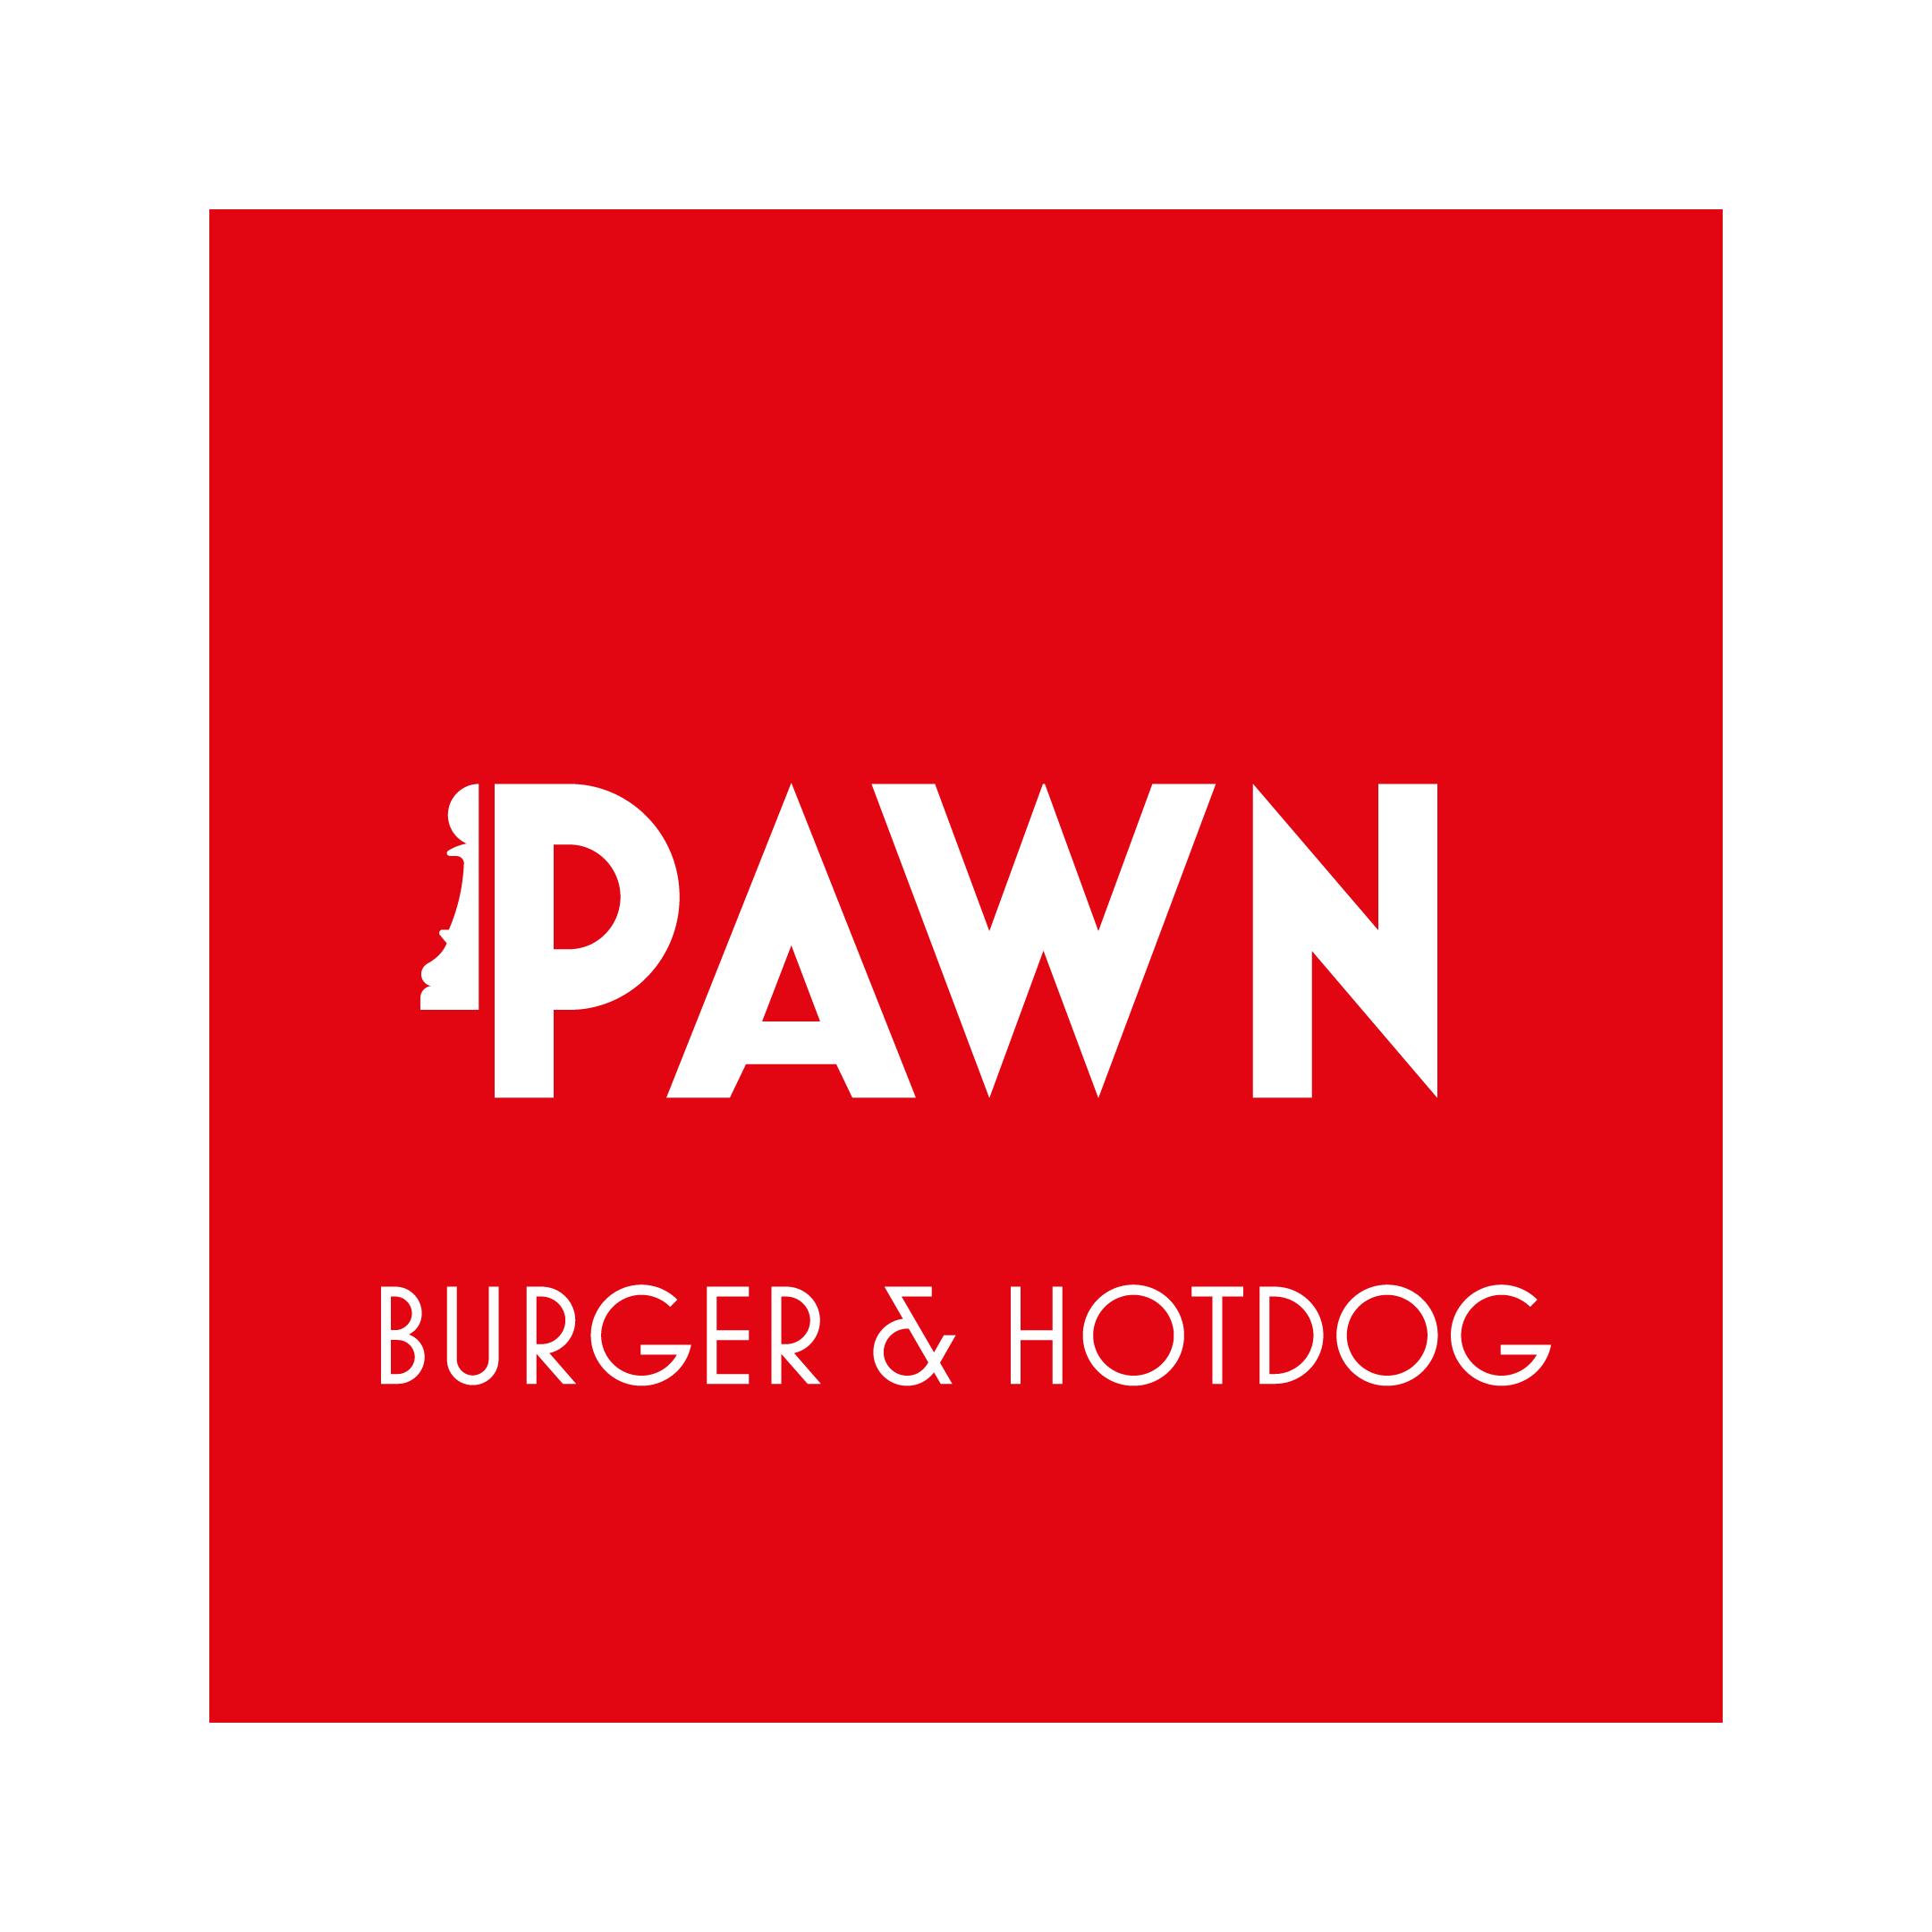 Pawn Burger